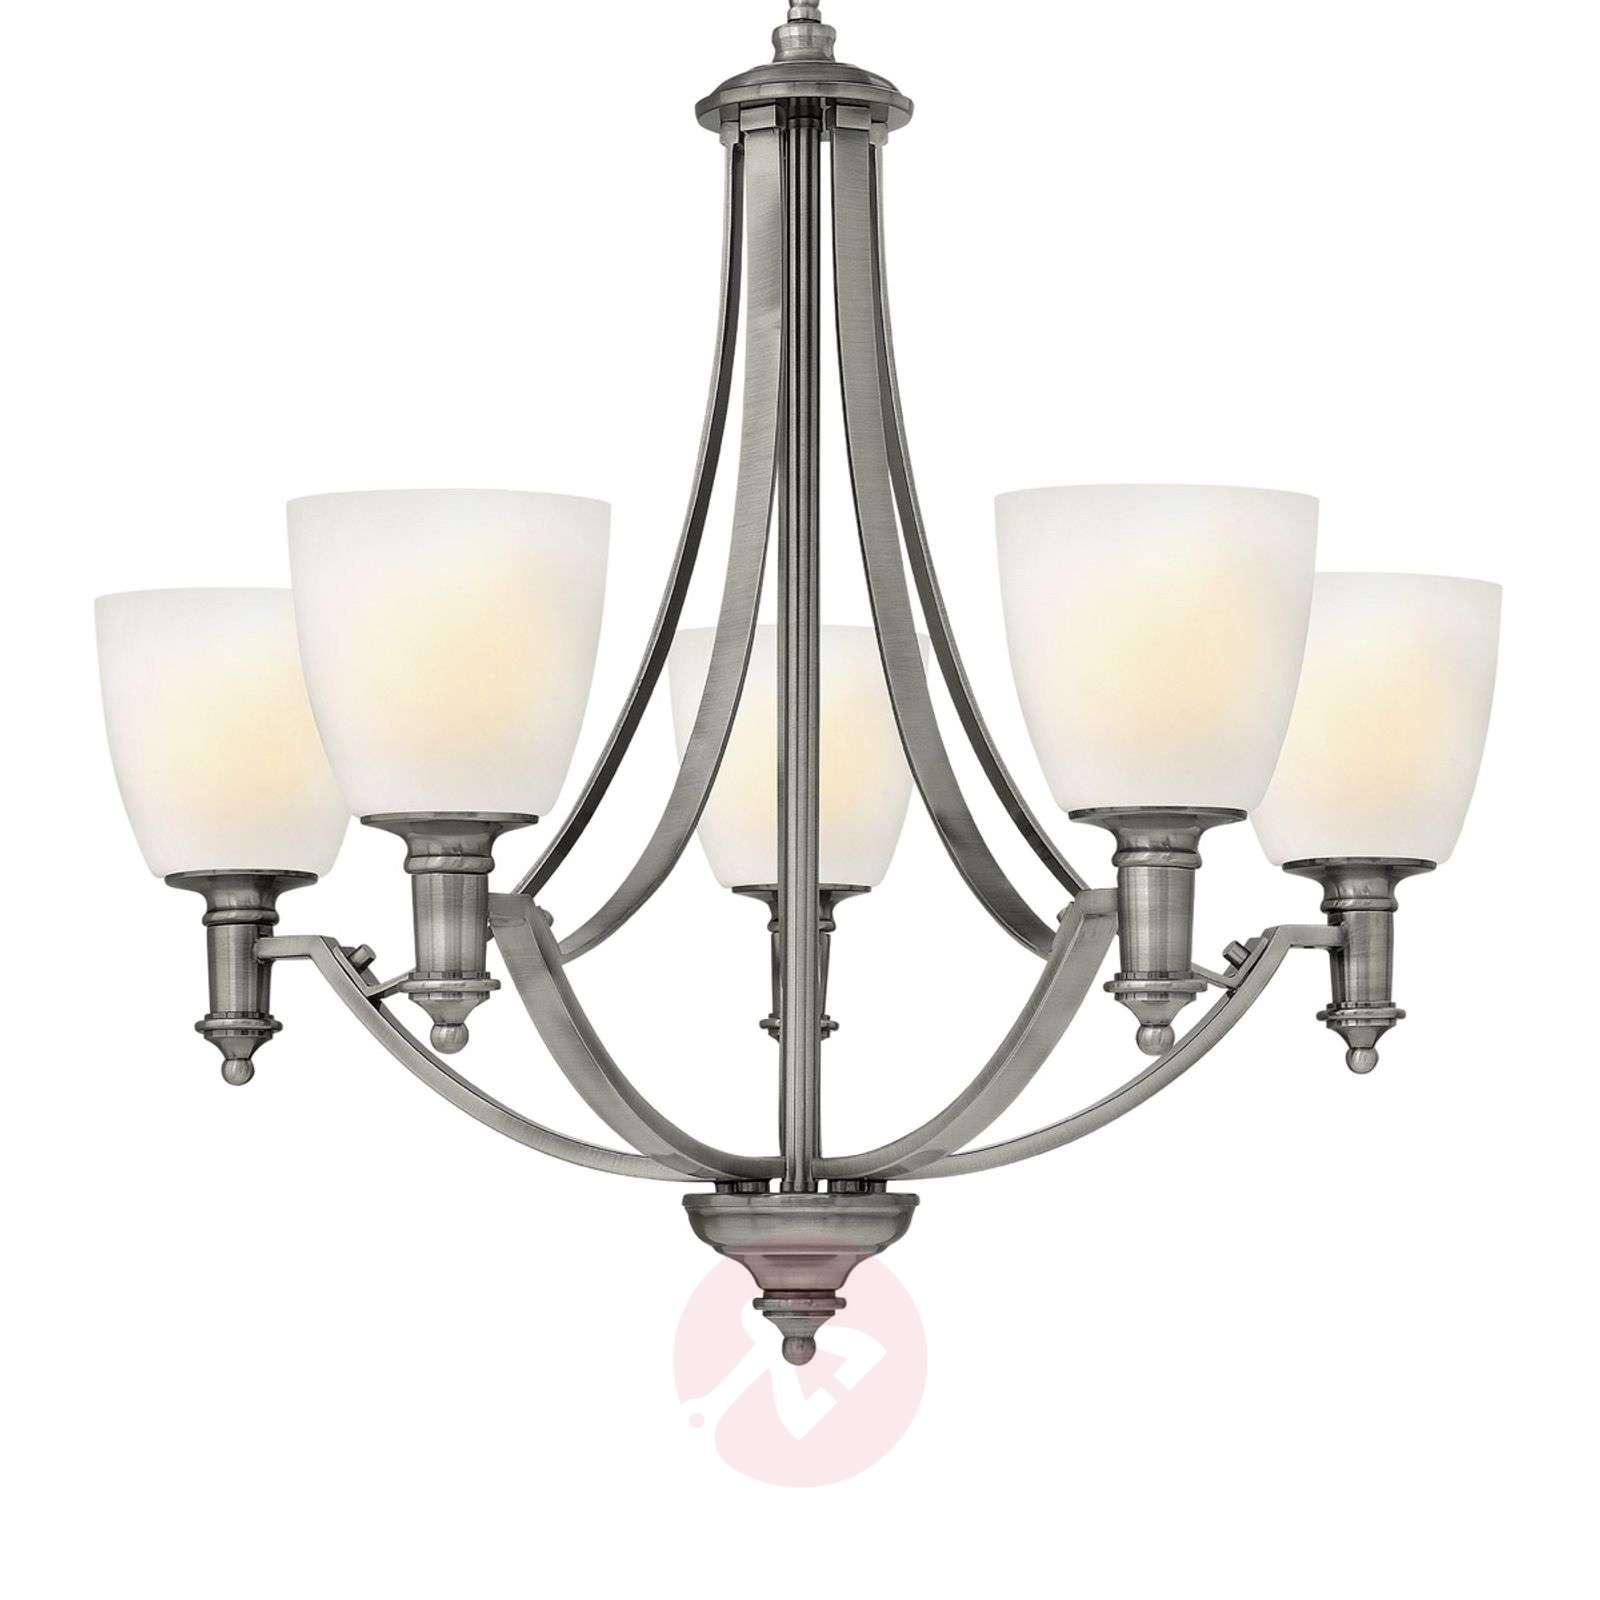 Truman Hanging Light Elegant-3048112X-01